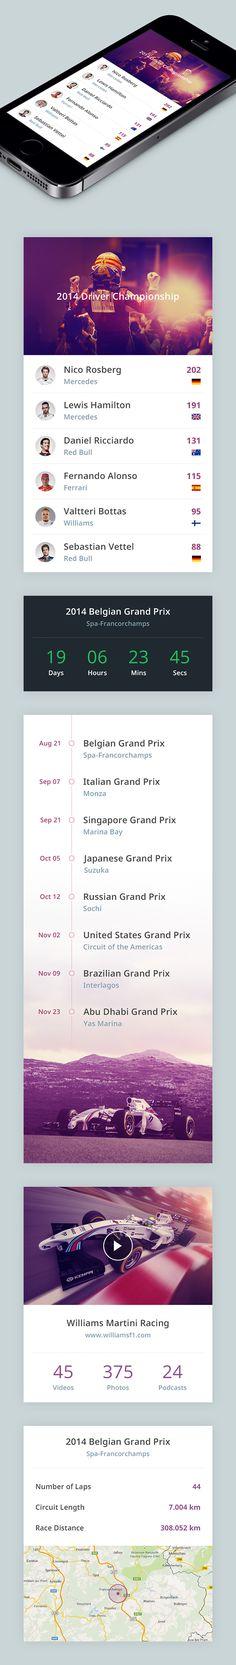 F1 App on Behance